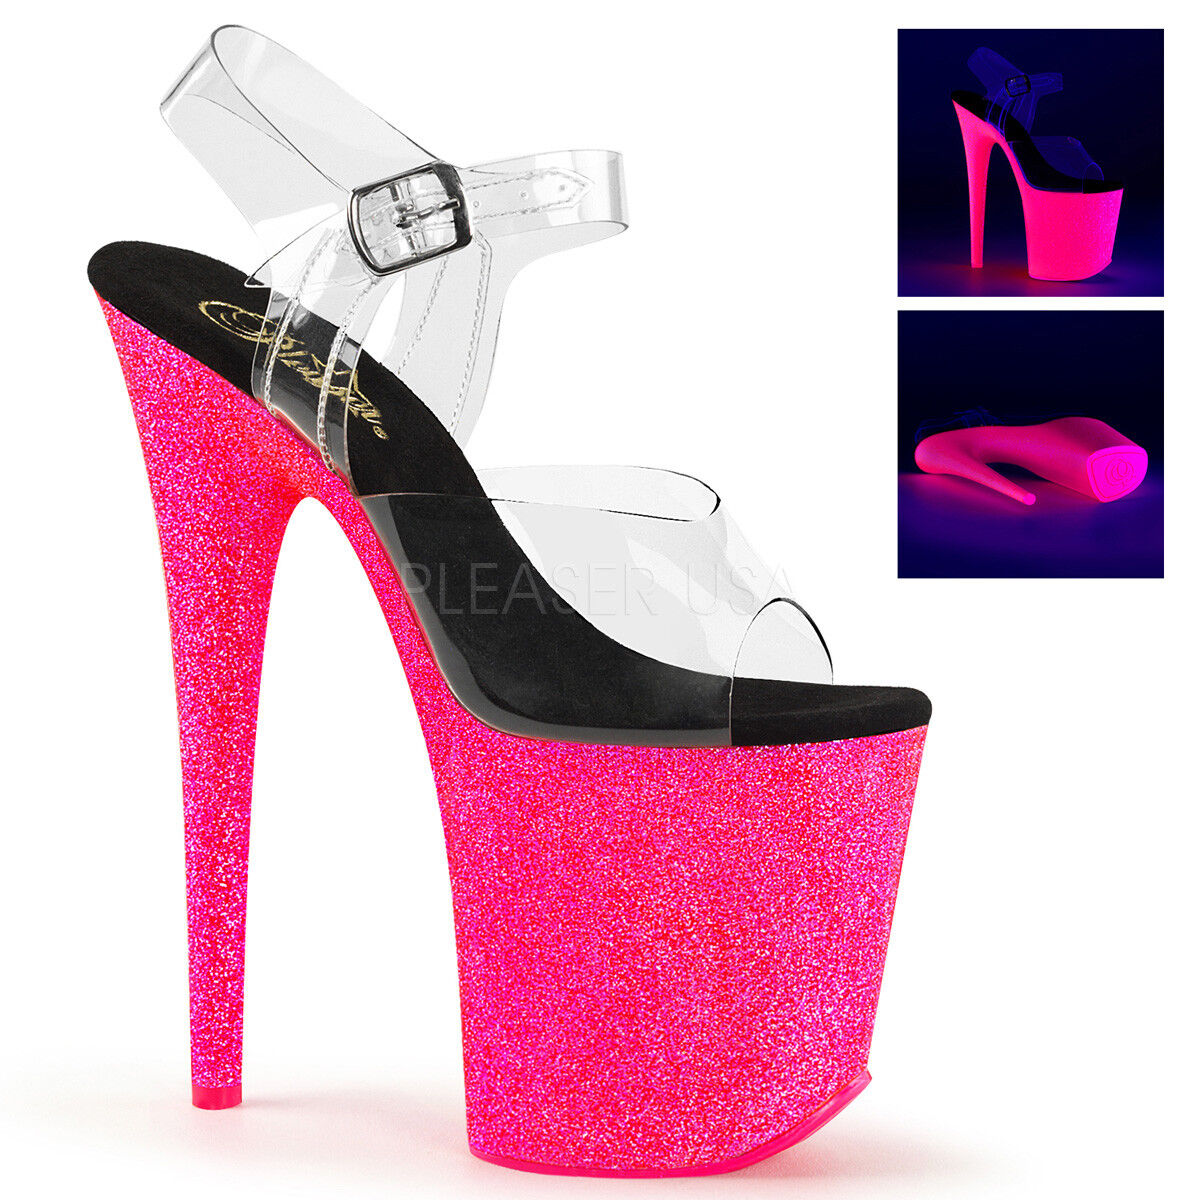 Pleaser FLAMINGO-808UVG Damenschuhe Neon Hot Pink Glitter Platform Stripper High Heel